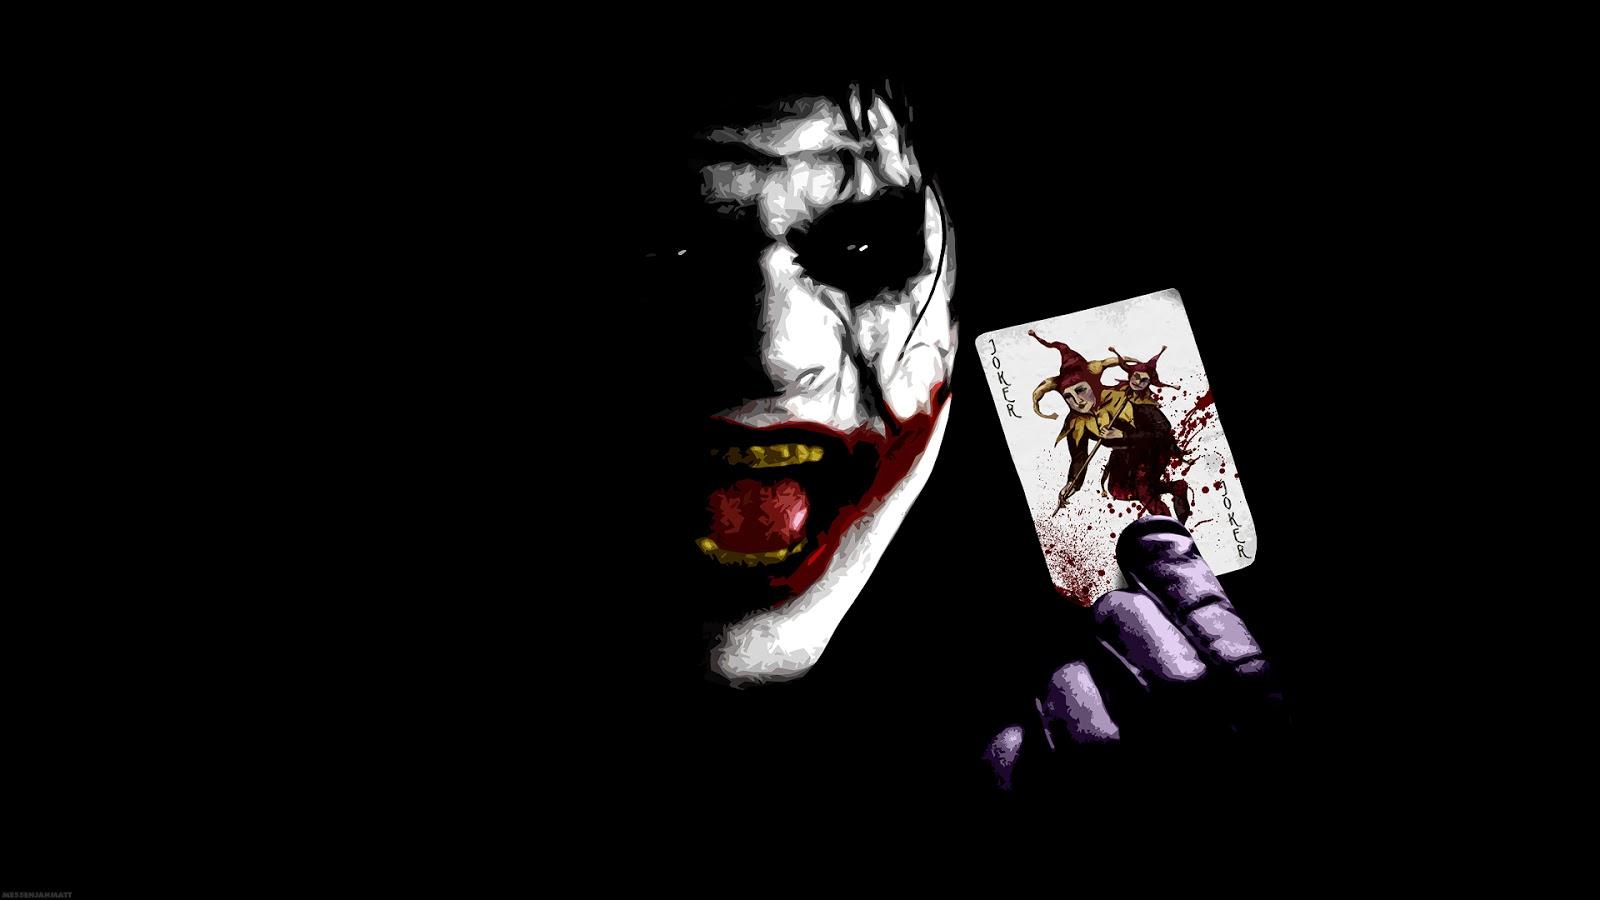 Wallpaper joker hd gratis download your title joker joker joker voltagebd Images